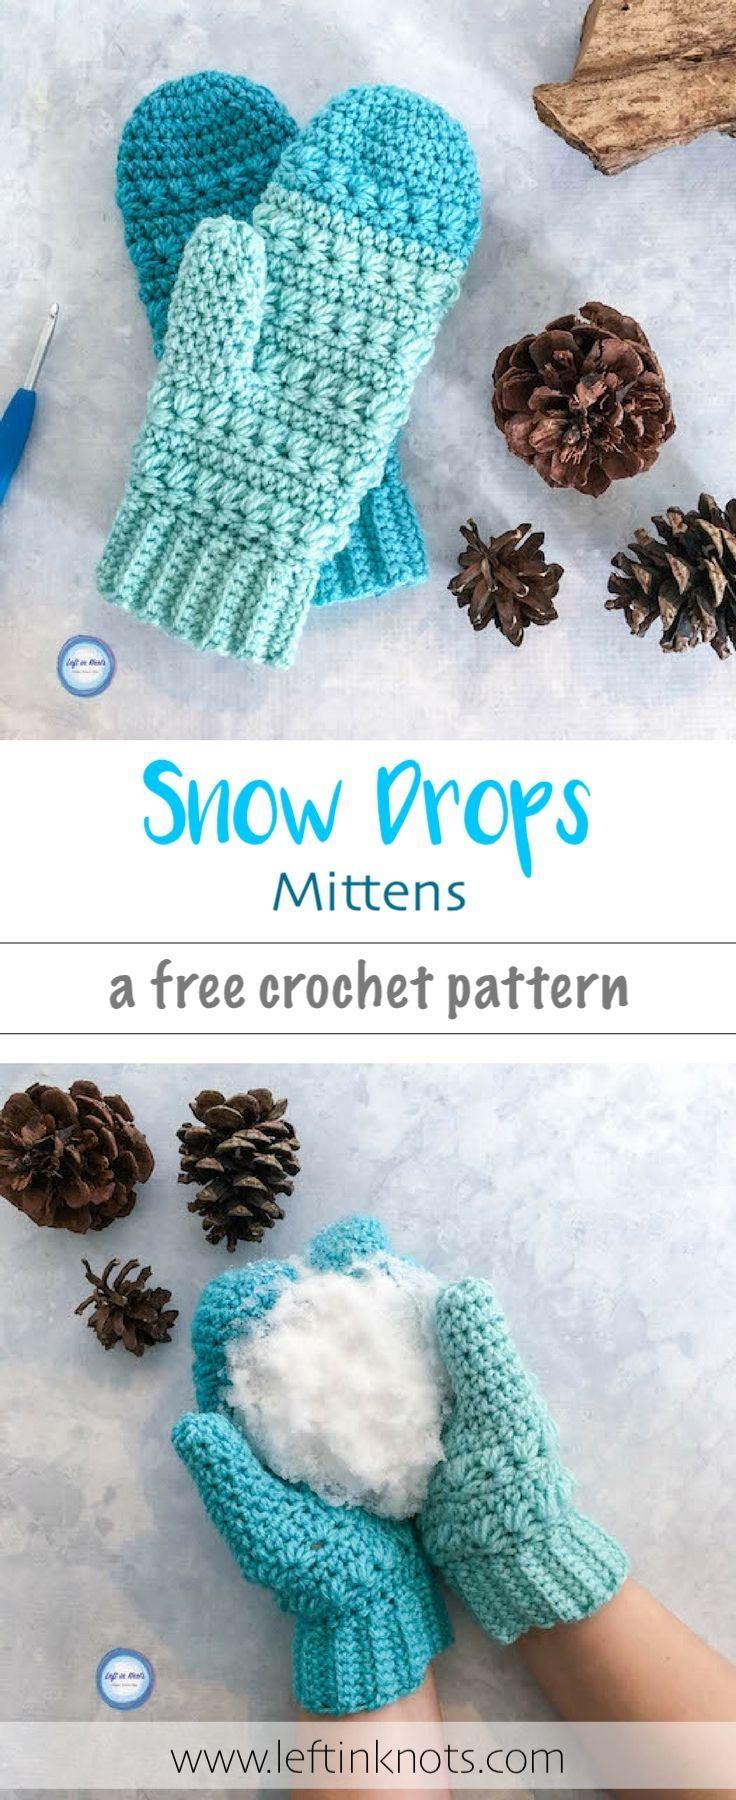 Snow Drops Mittens Free Crochet Pattern | Pinterest | Tejido ...